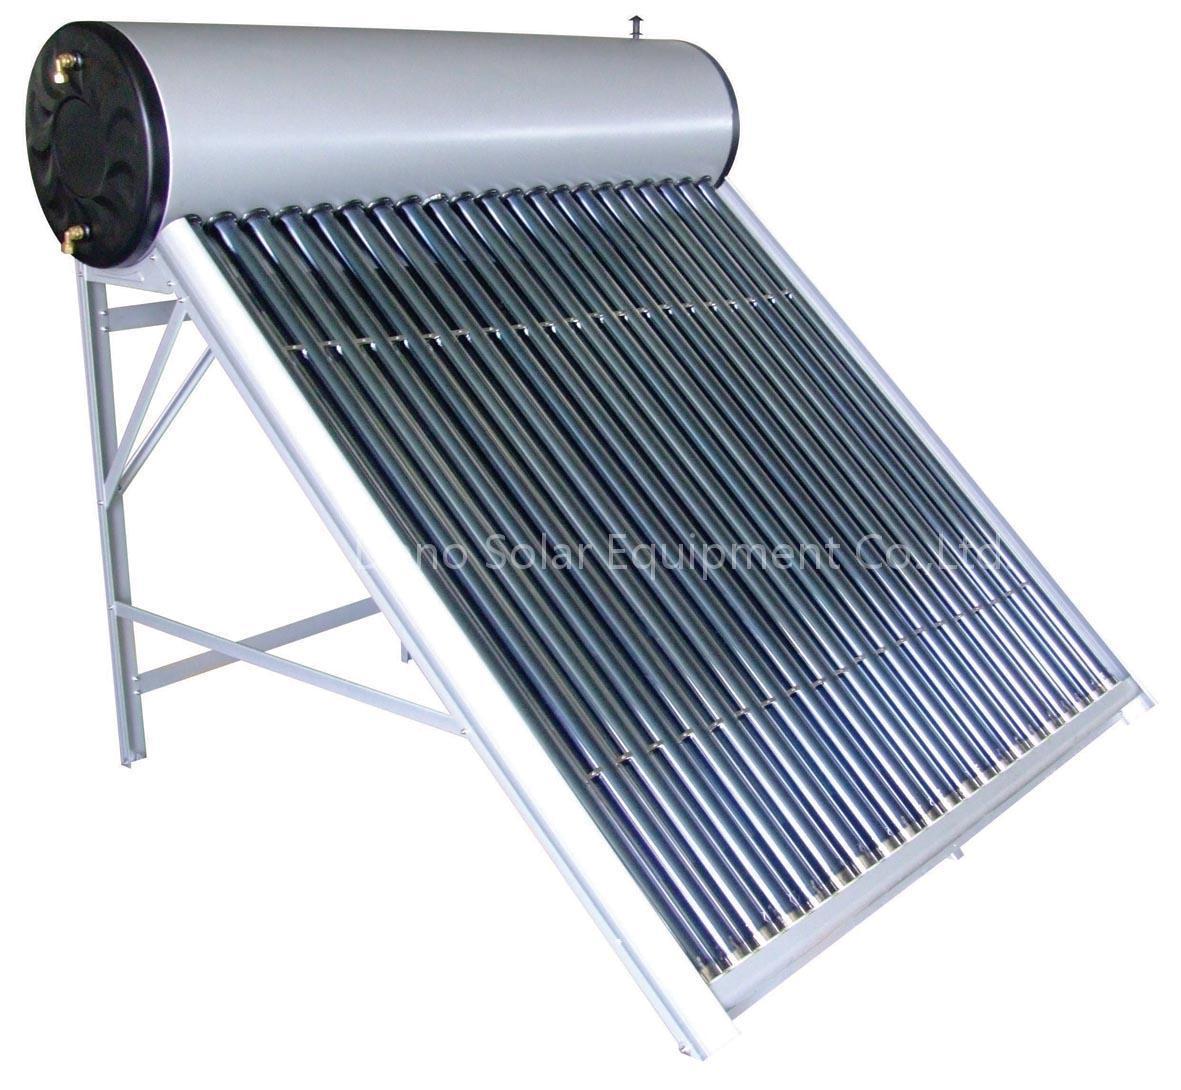 Solar Hot Water System Dubai Qatar Saudi Arabia Oman